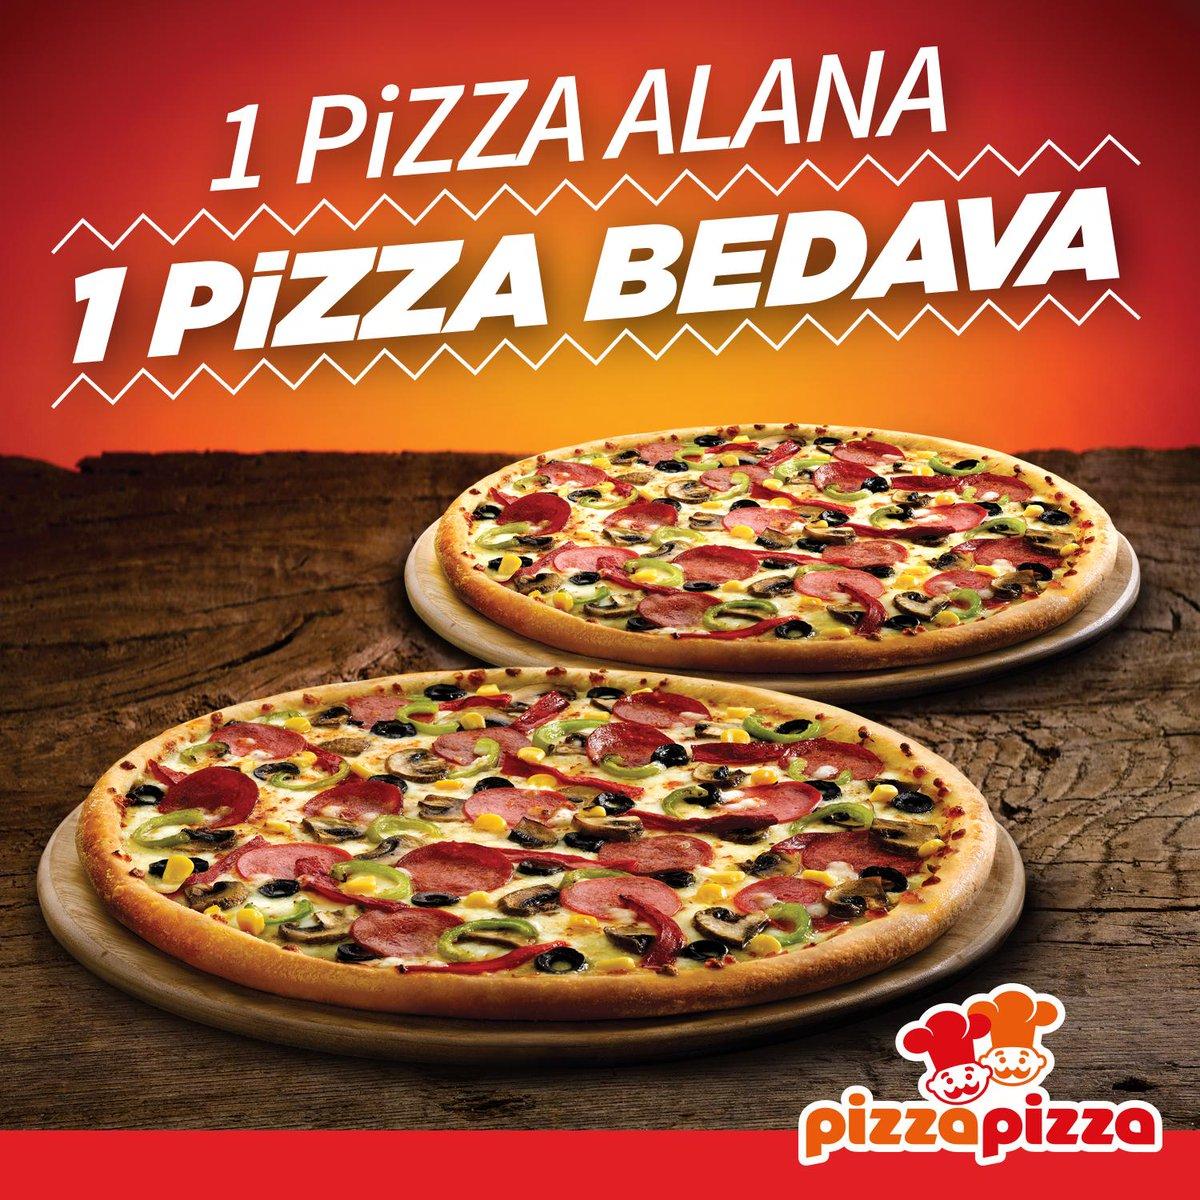 pizzapizzadelivery pizzapizzadlvry twitter. Black Bedroom Furniture Sets. Home Design Ideas